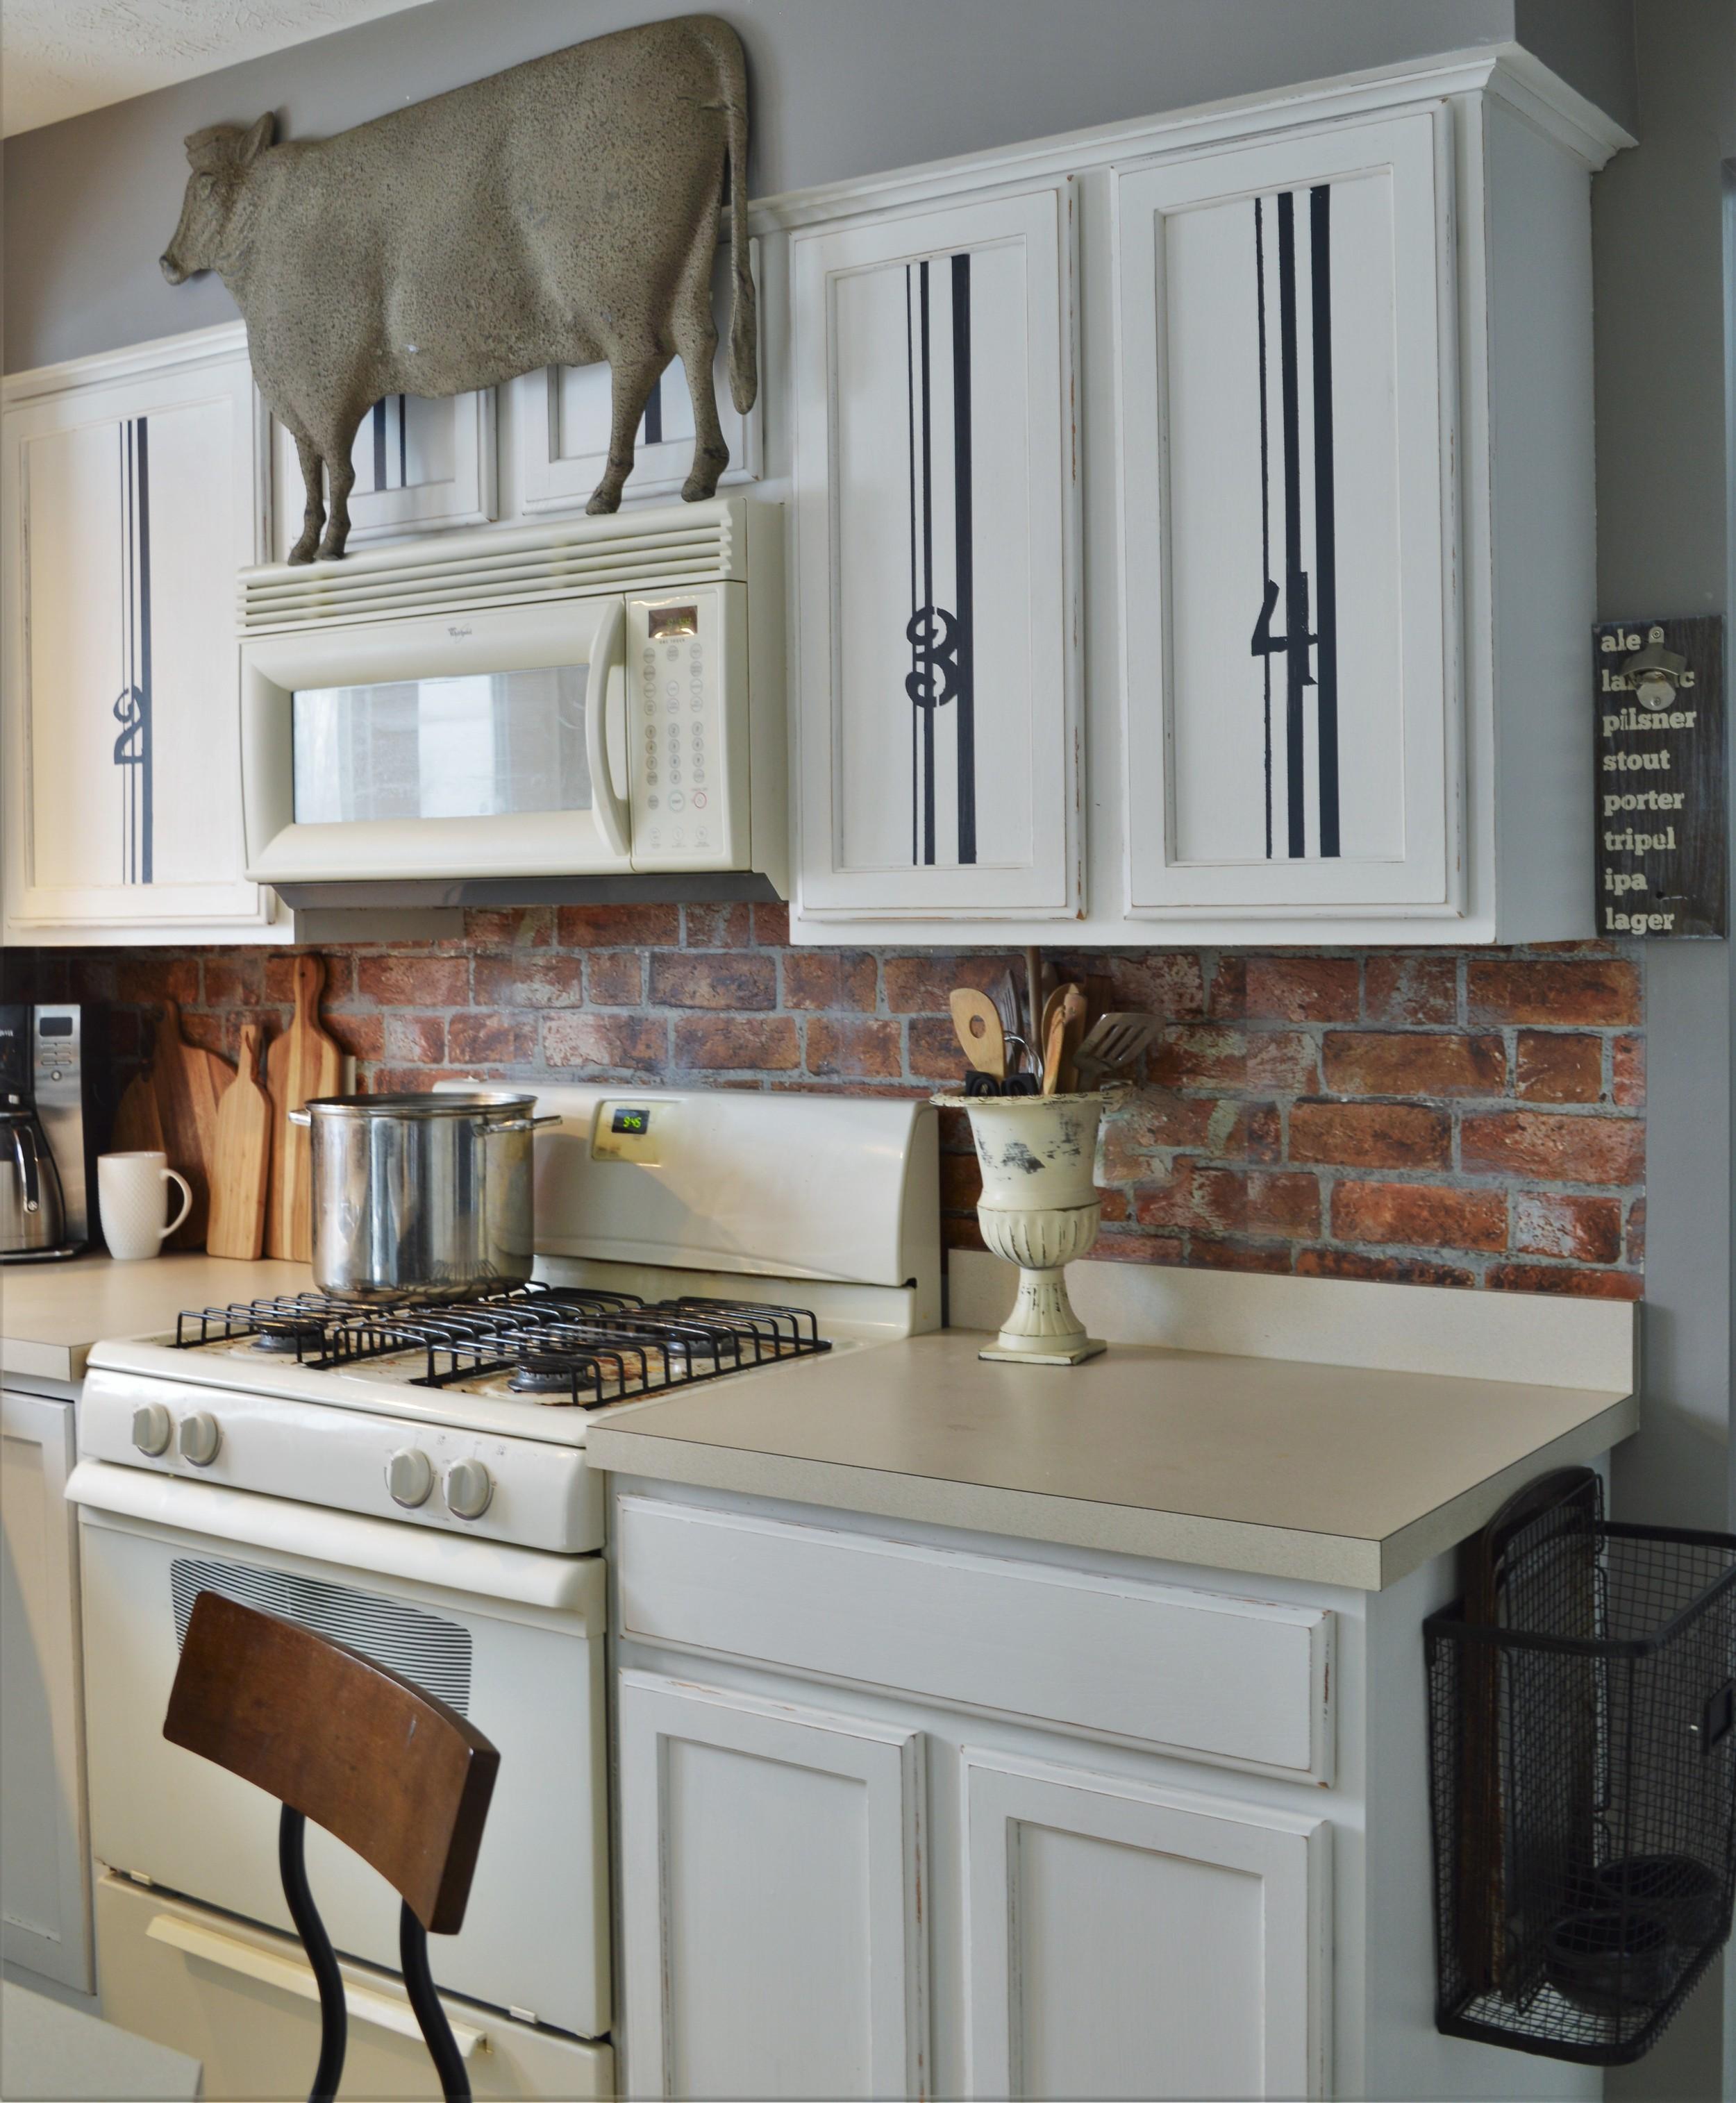 Farmhouse Kitchen Cabinets: Adding Farmhouse Character